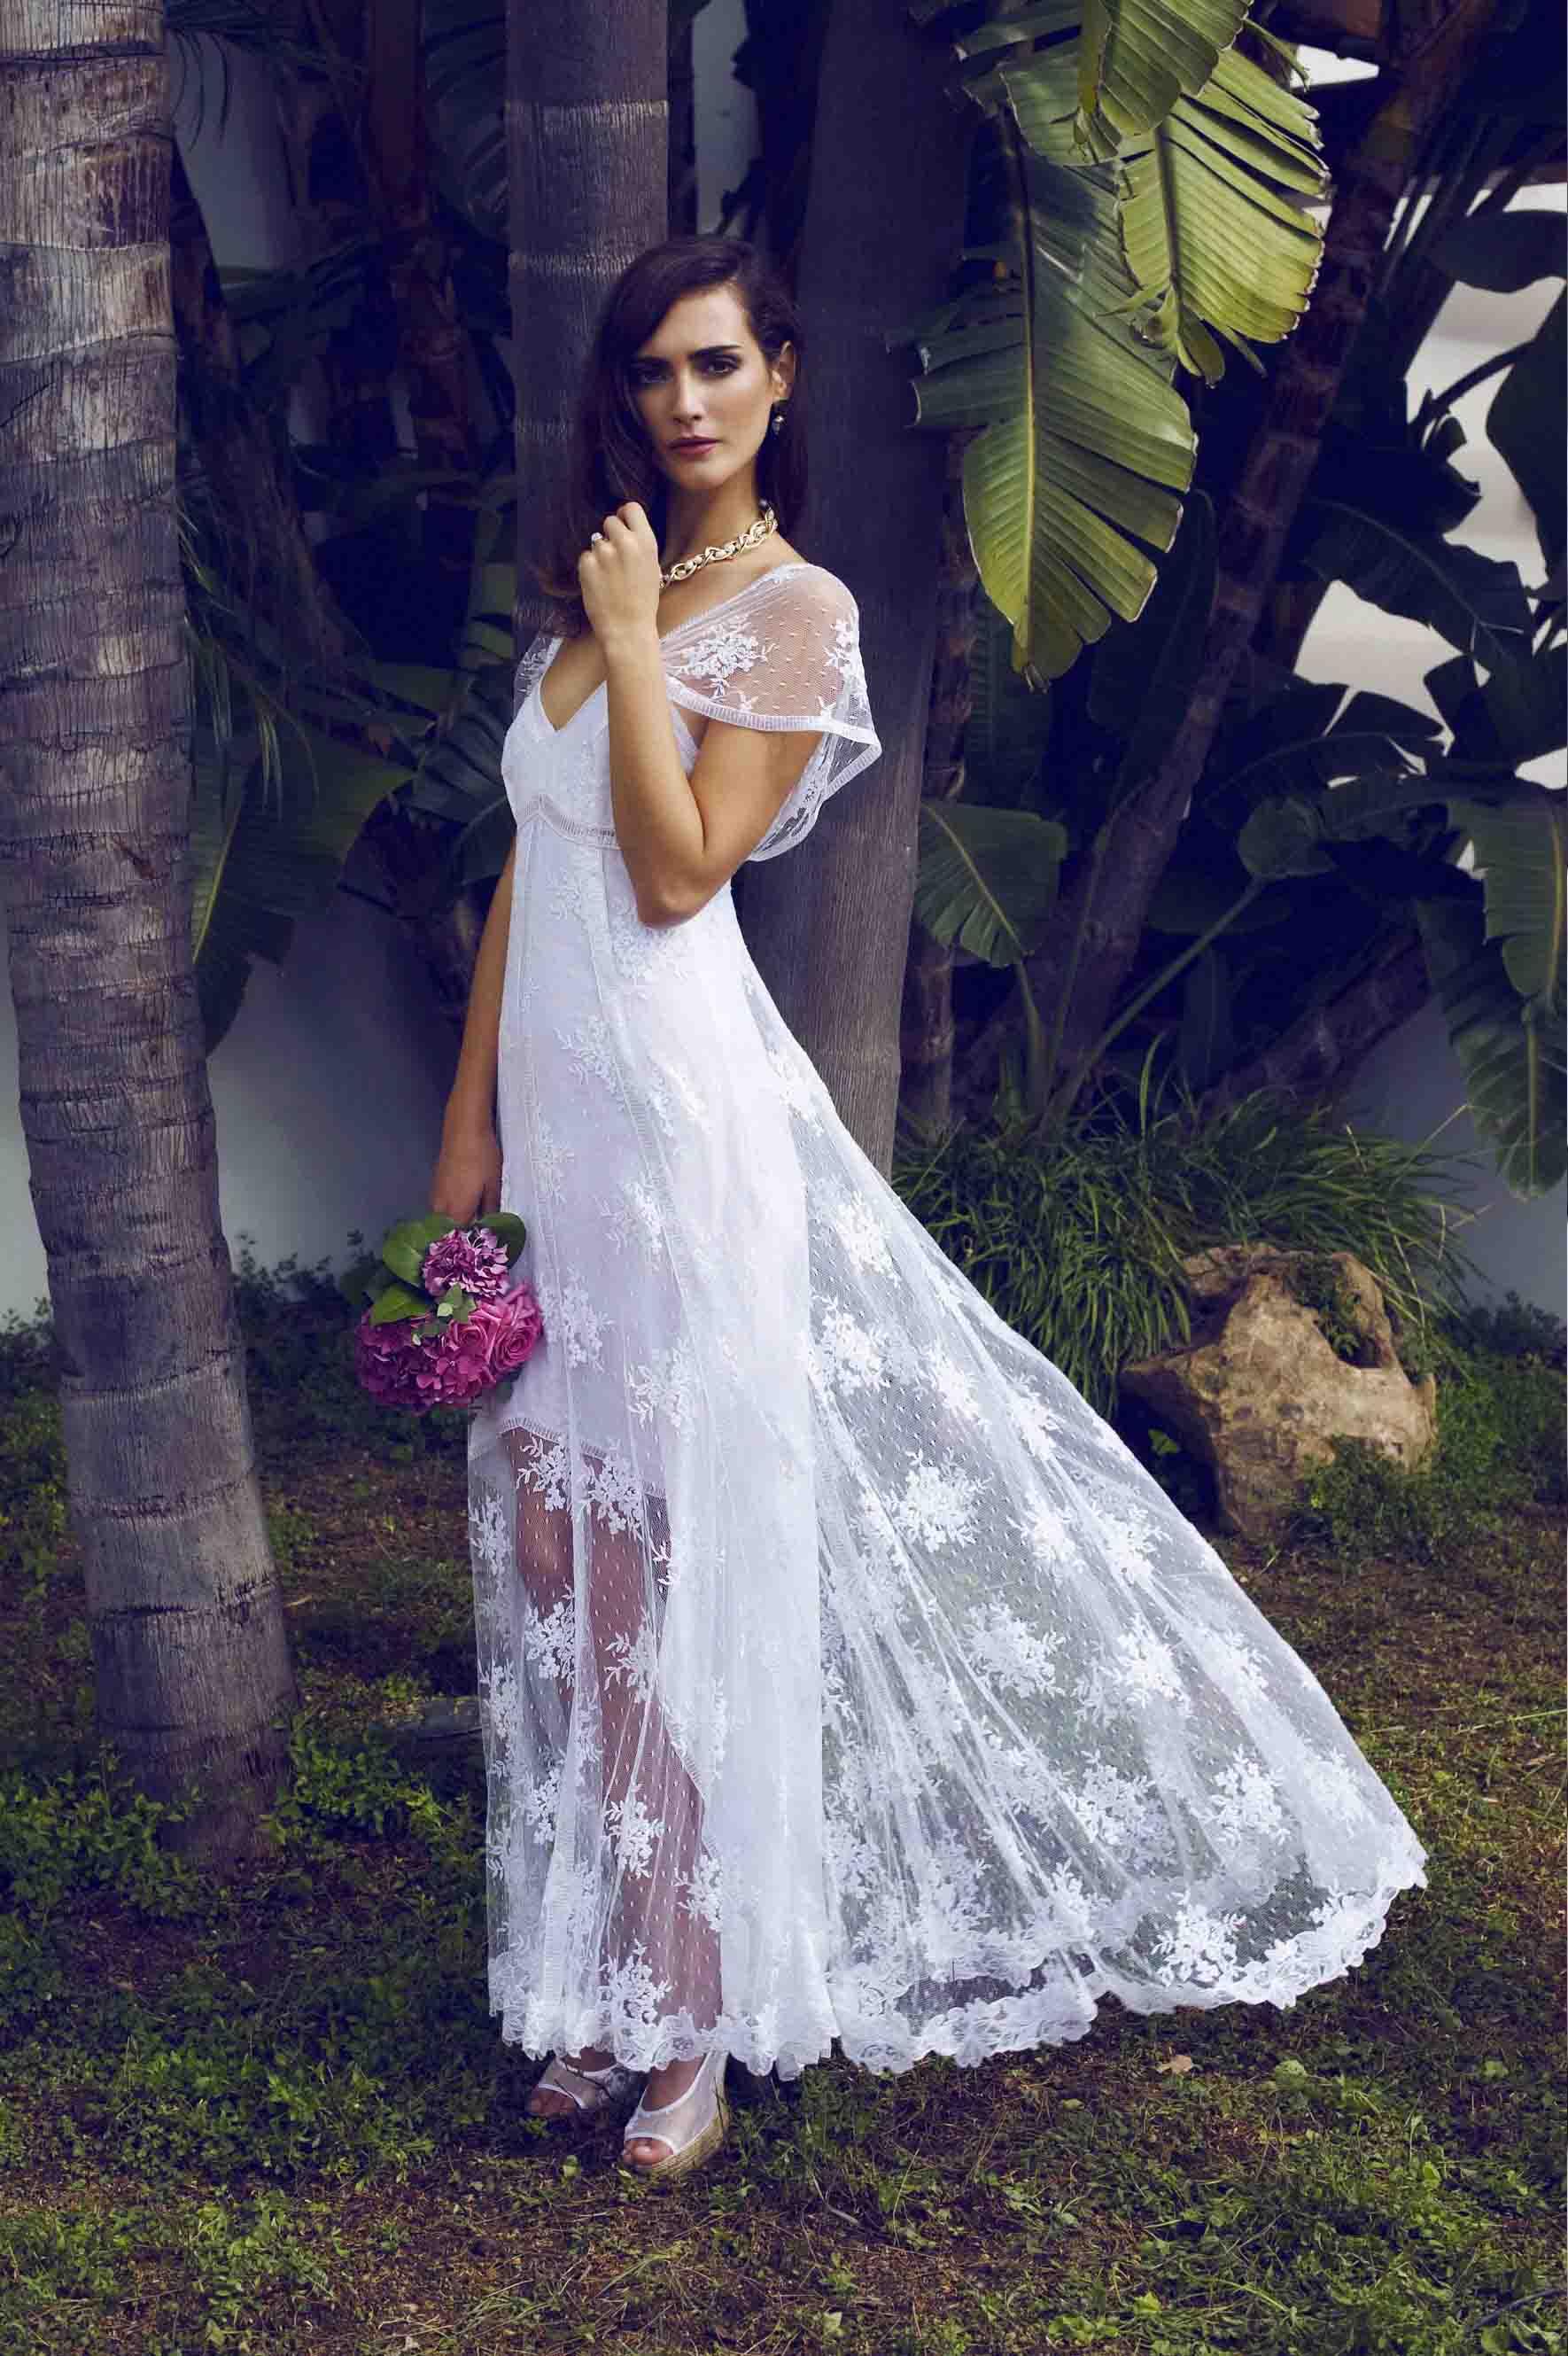 Vestido de novia boho | El blog de Ana Suero